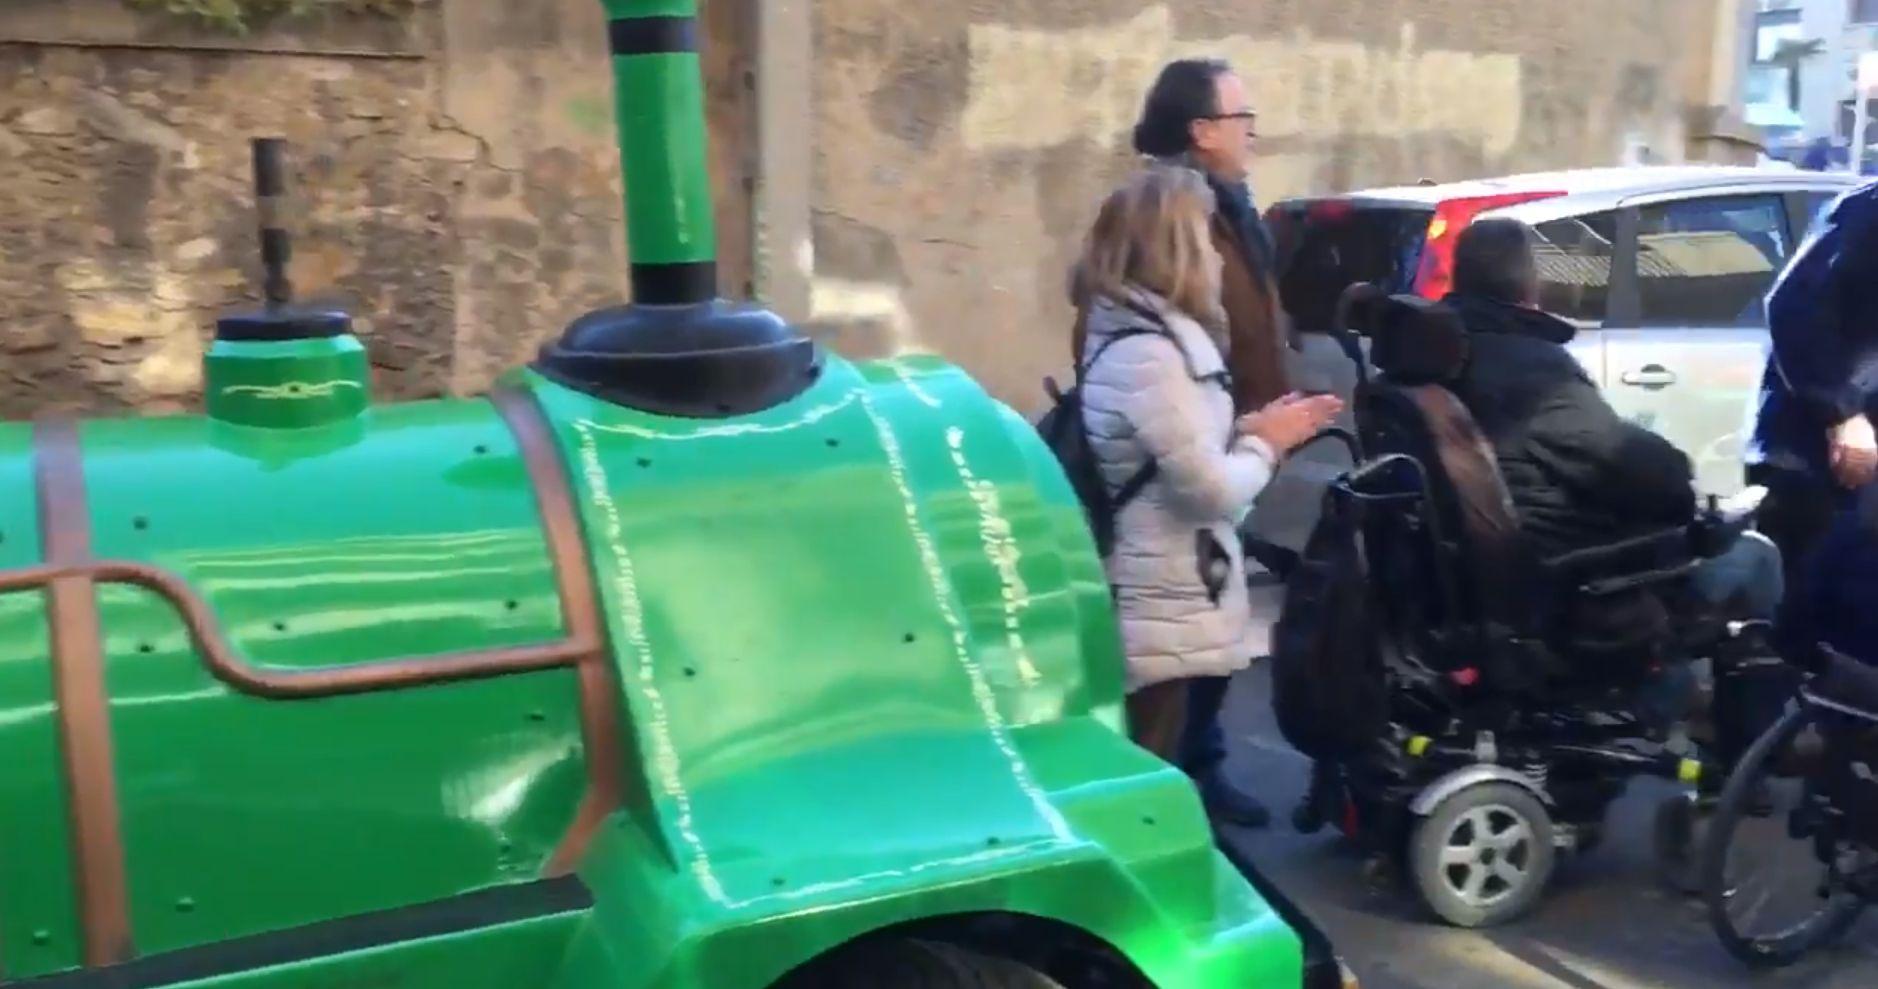 Moment de la protesta. Captura del vídeo de www.cerdanyola.info